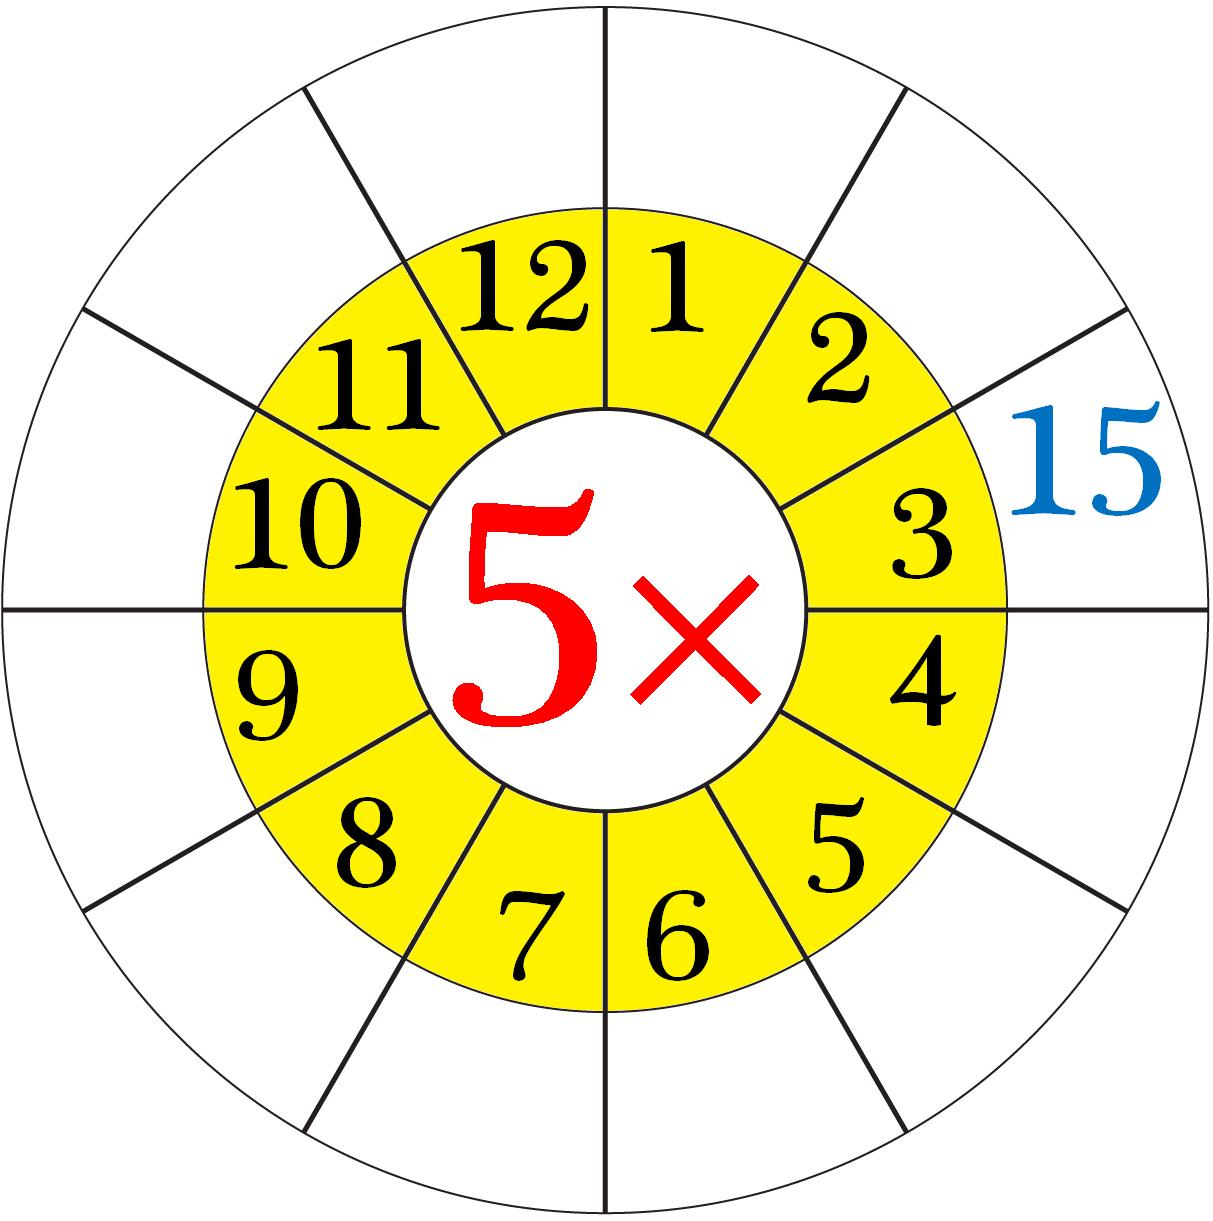 Worksheet On Multiplication Table Of 5 In 2018